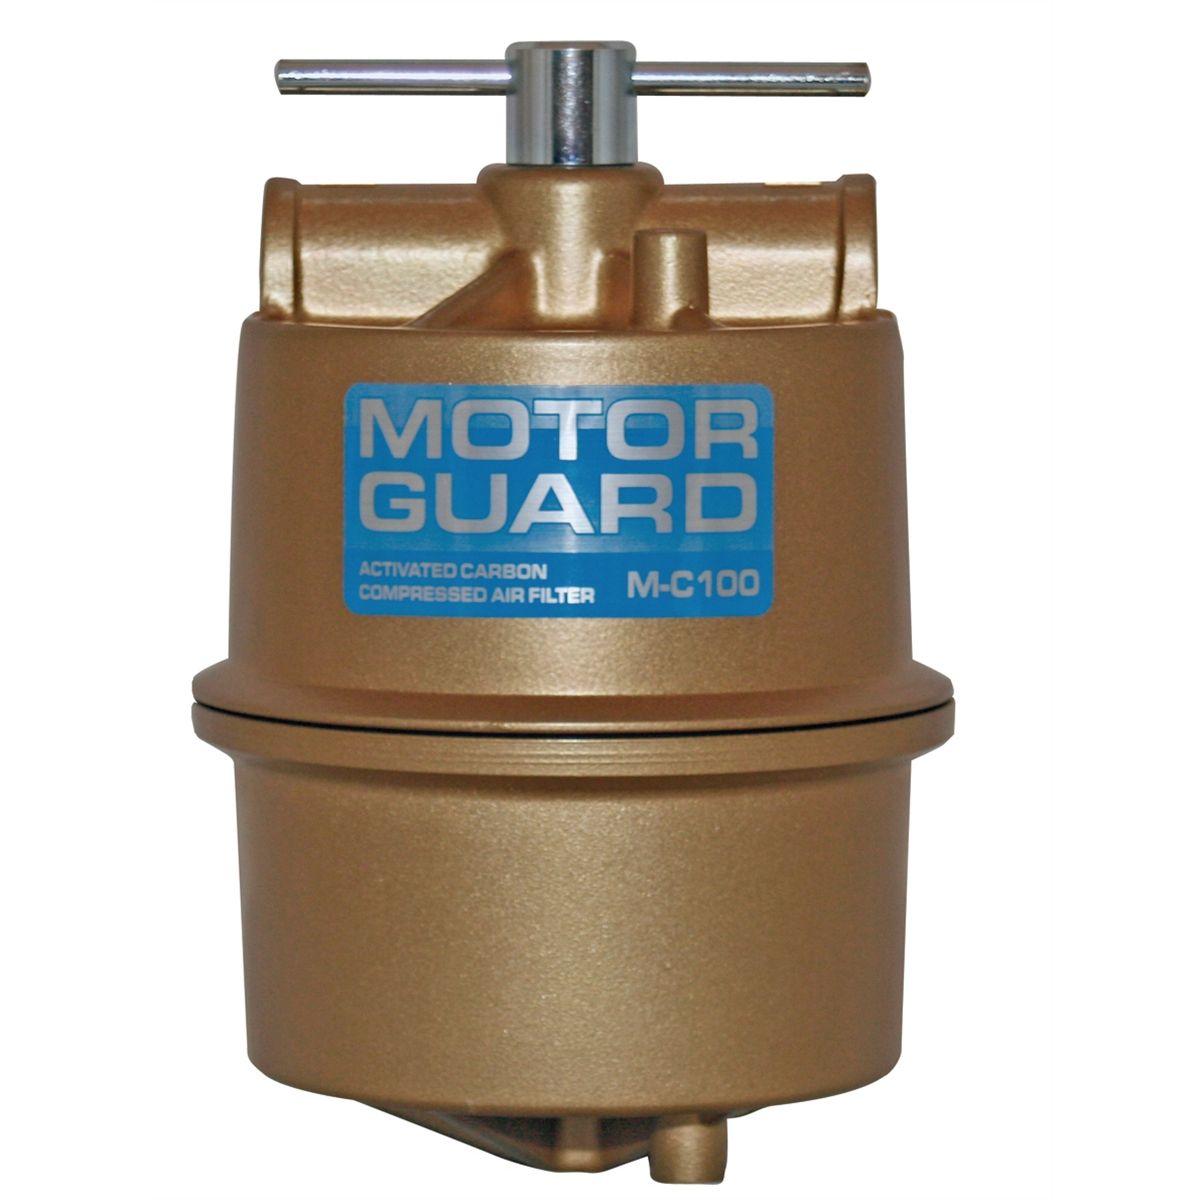 Motor Guard M C100 1 2 Npt Activated Carbon Filter Jlmm C100